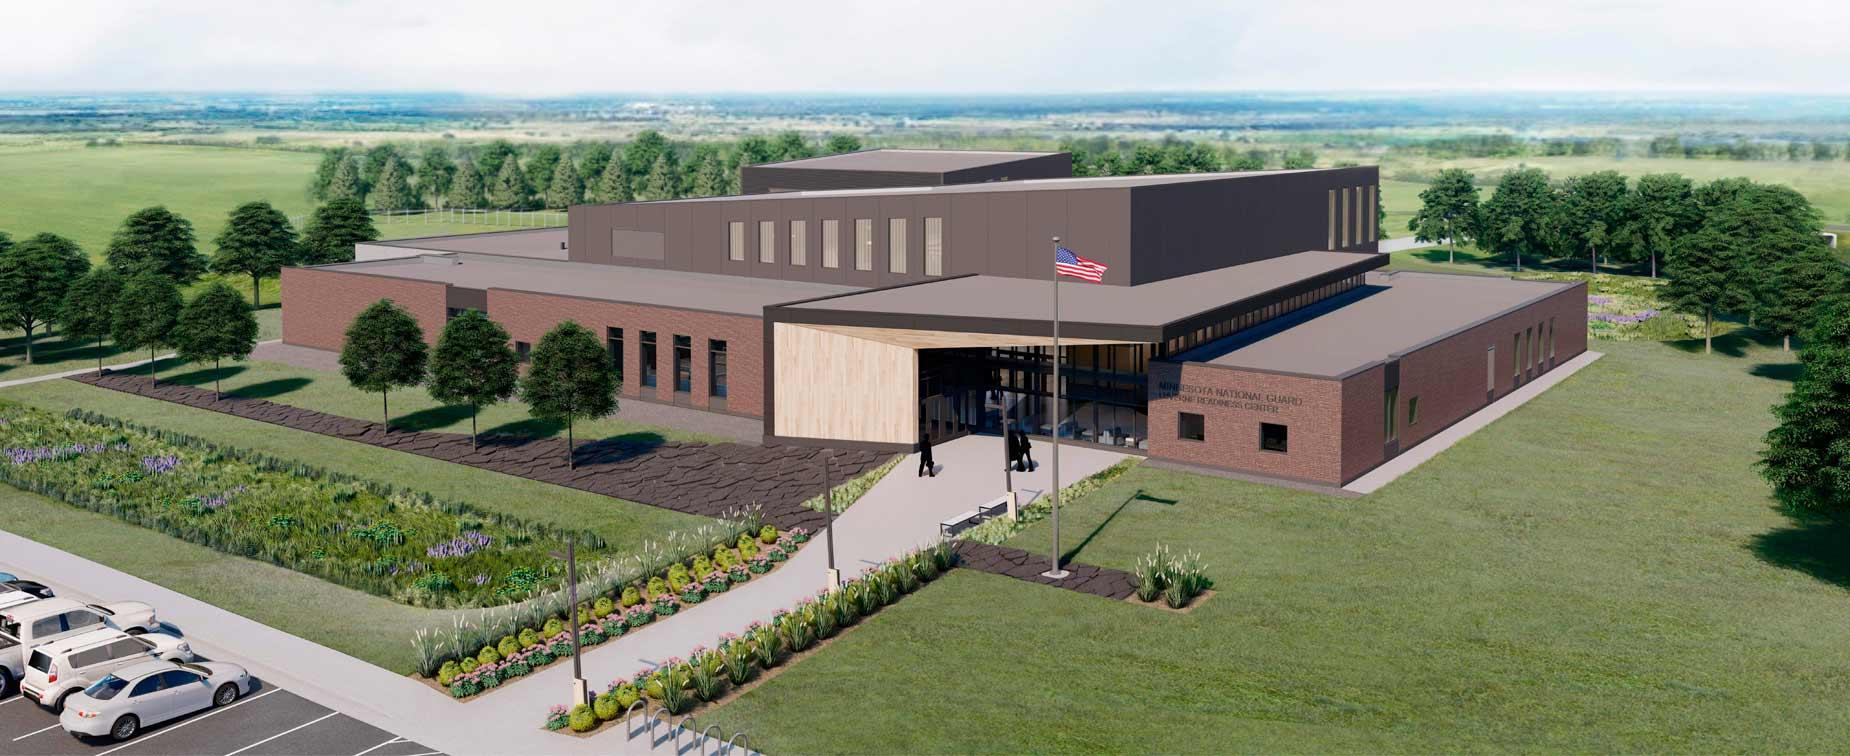 Exterior of Minnesota National Guard Luverne Readiness Center